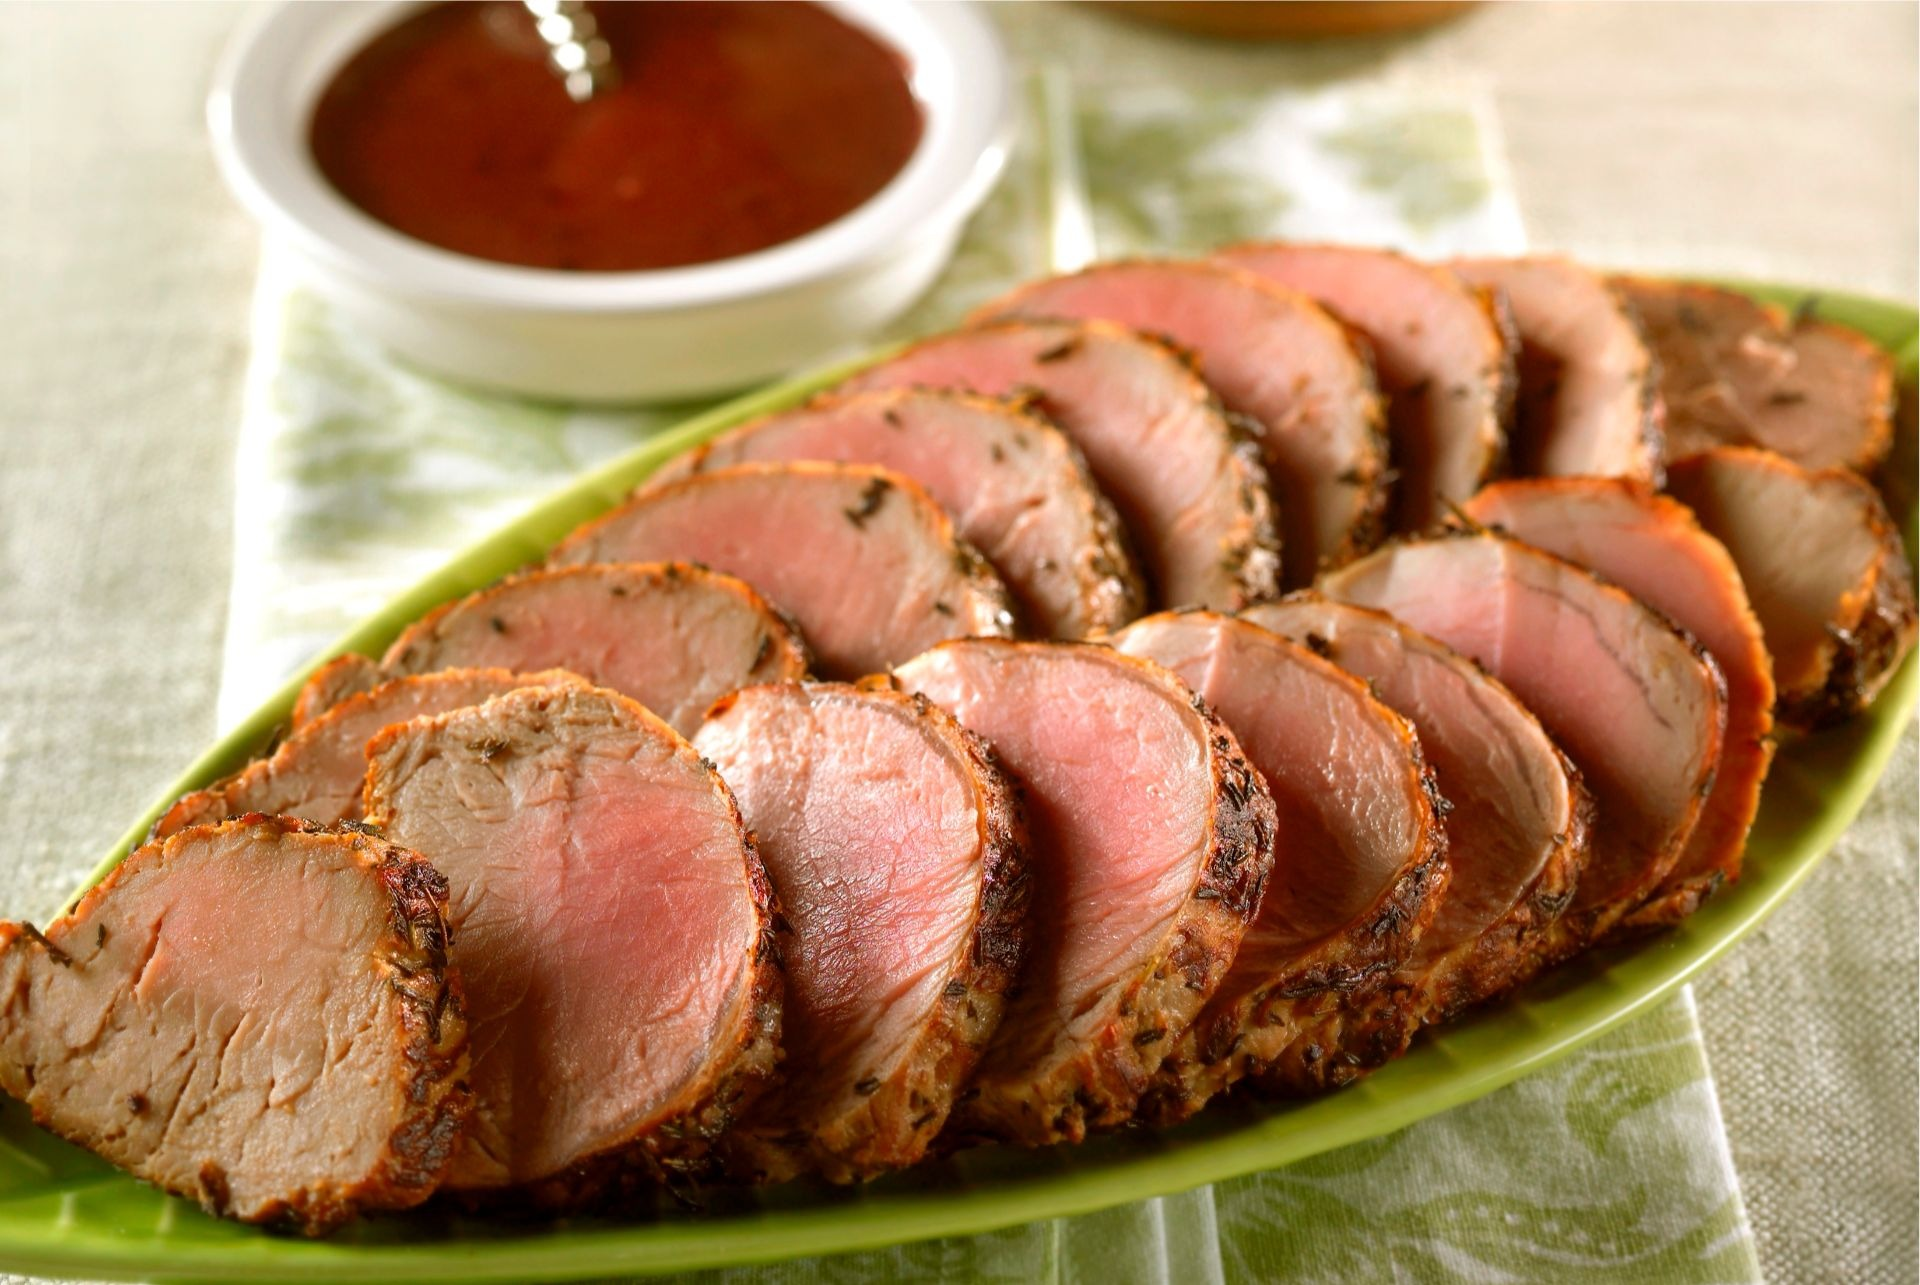 Platter of sliced pork tenderloin with small dish of raspberry mustard sauce in background